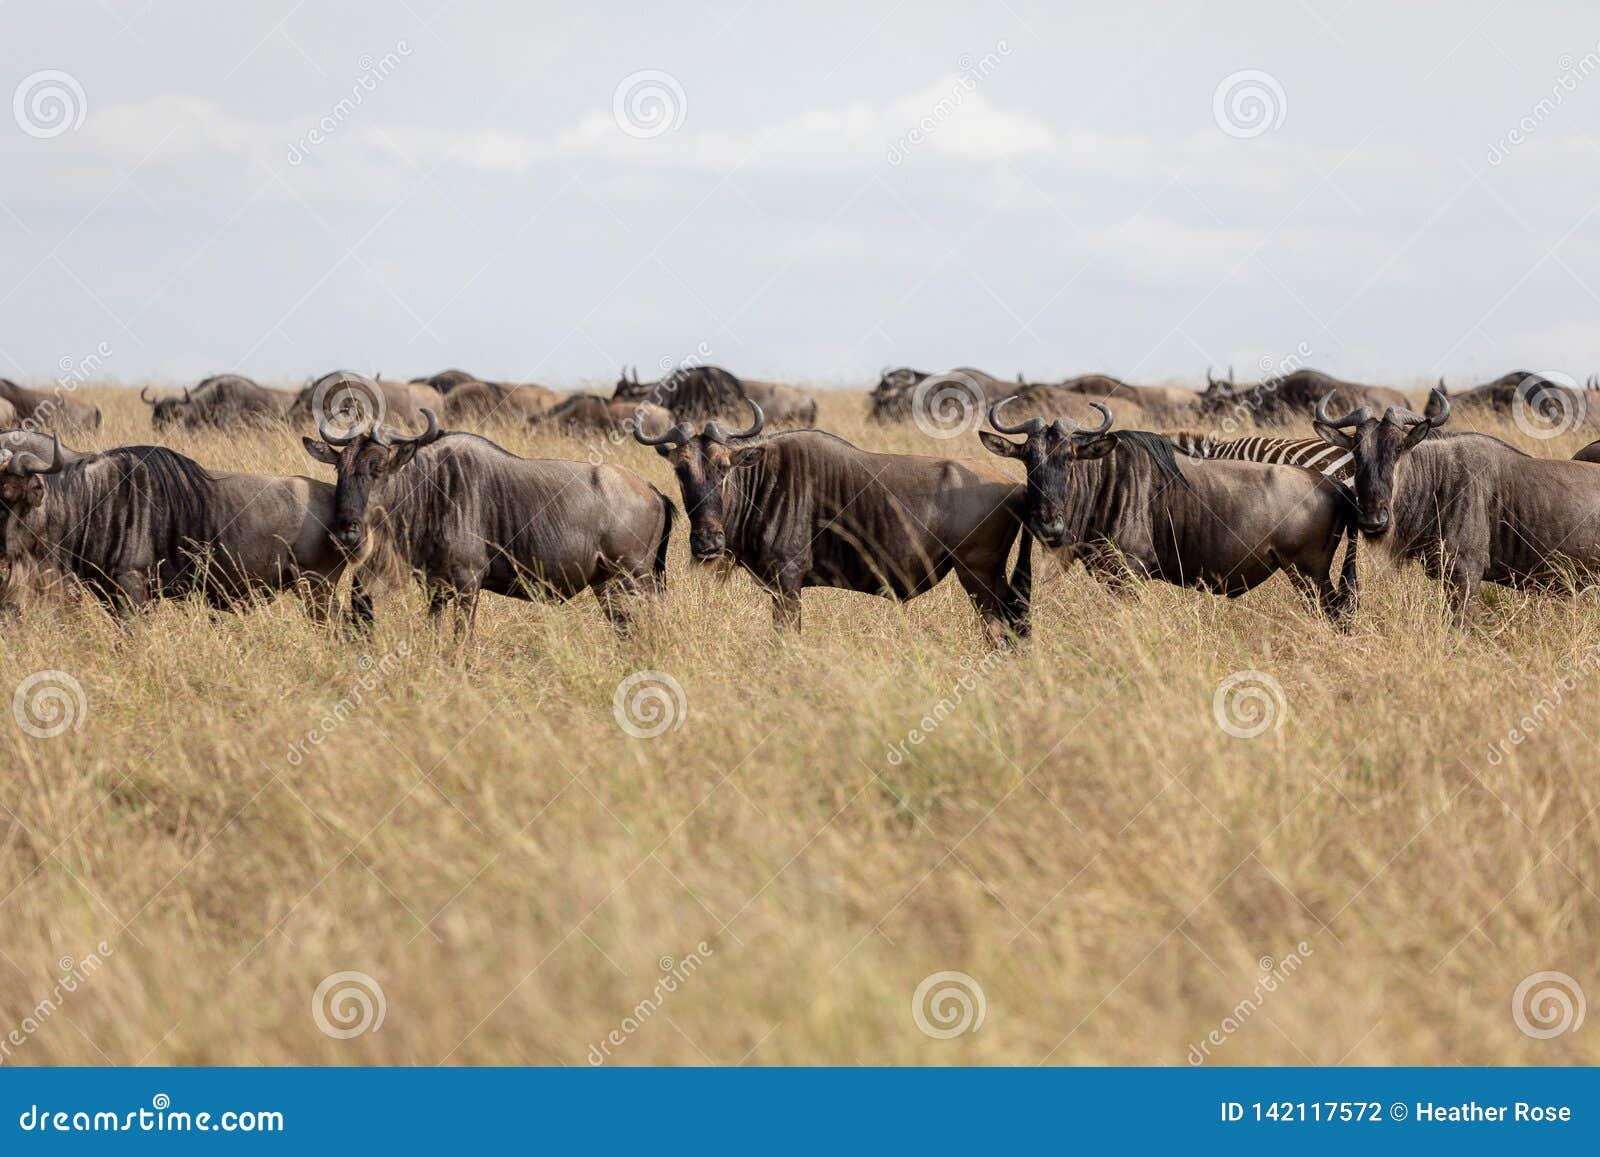 Wildebeest na równinach Masai Mara, Kenja, Afryka